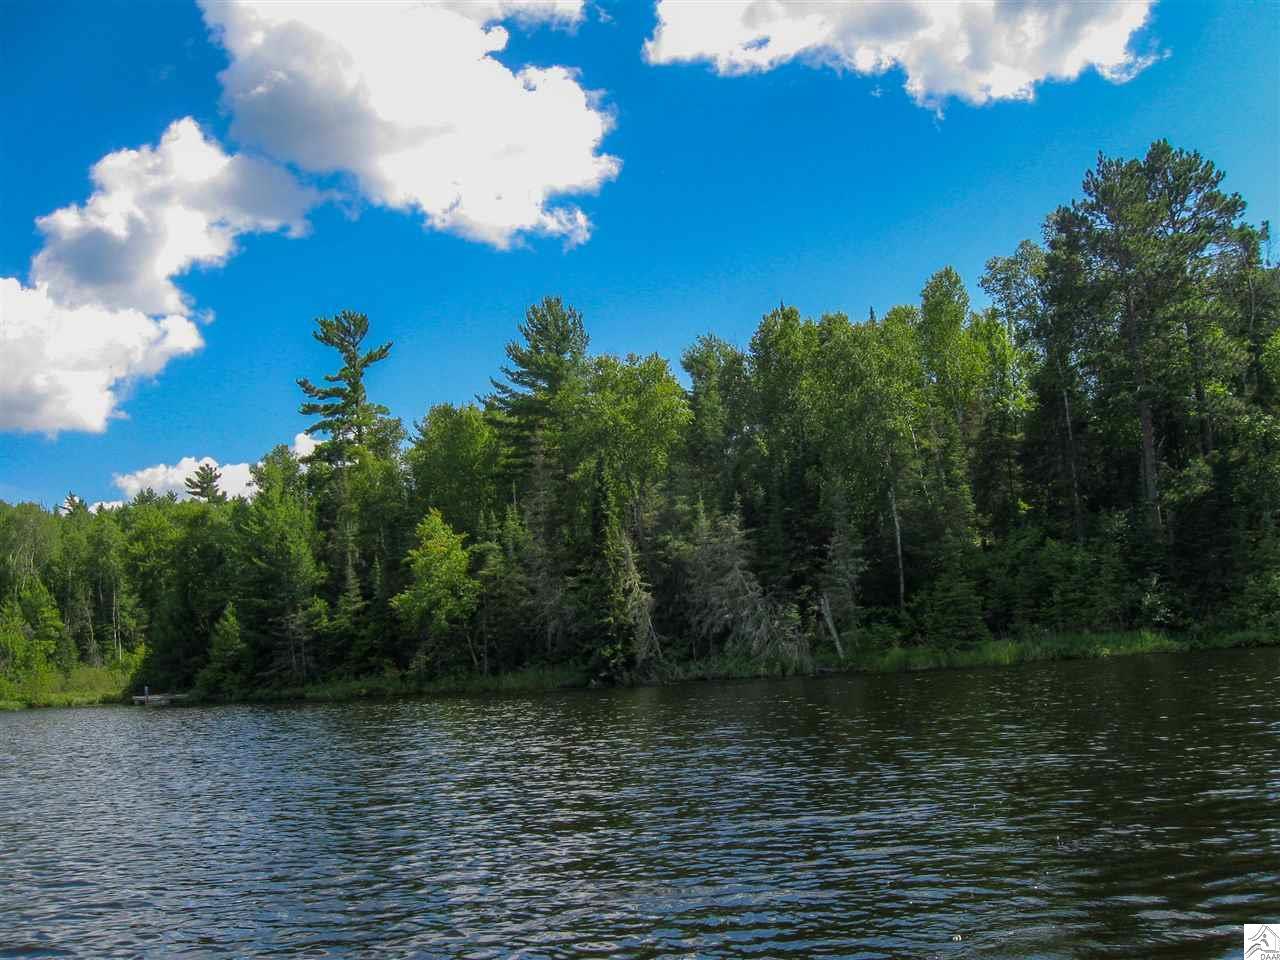 TBD Twin Lake, Ely, MN 55731